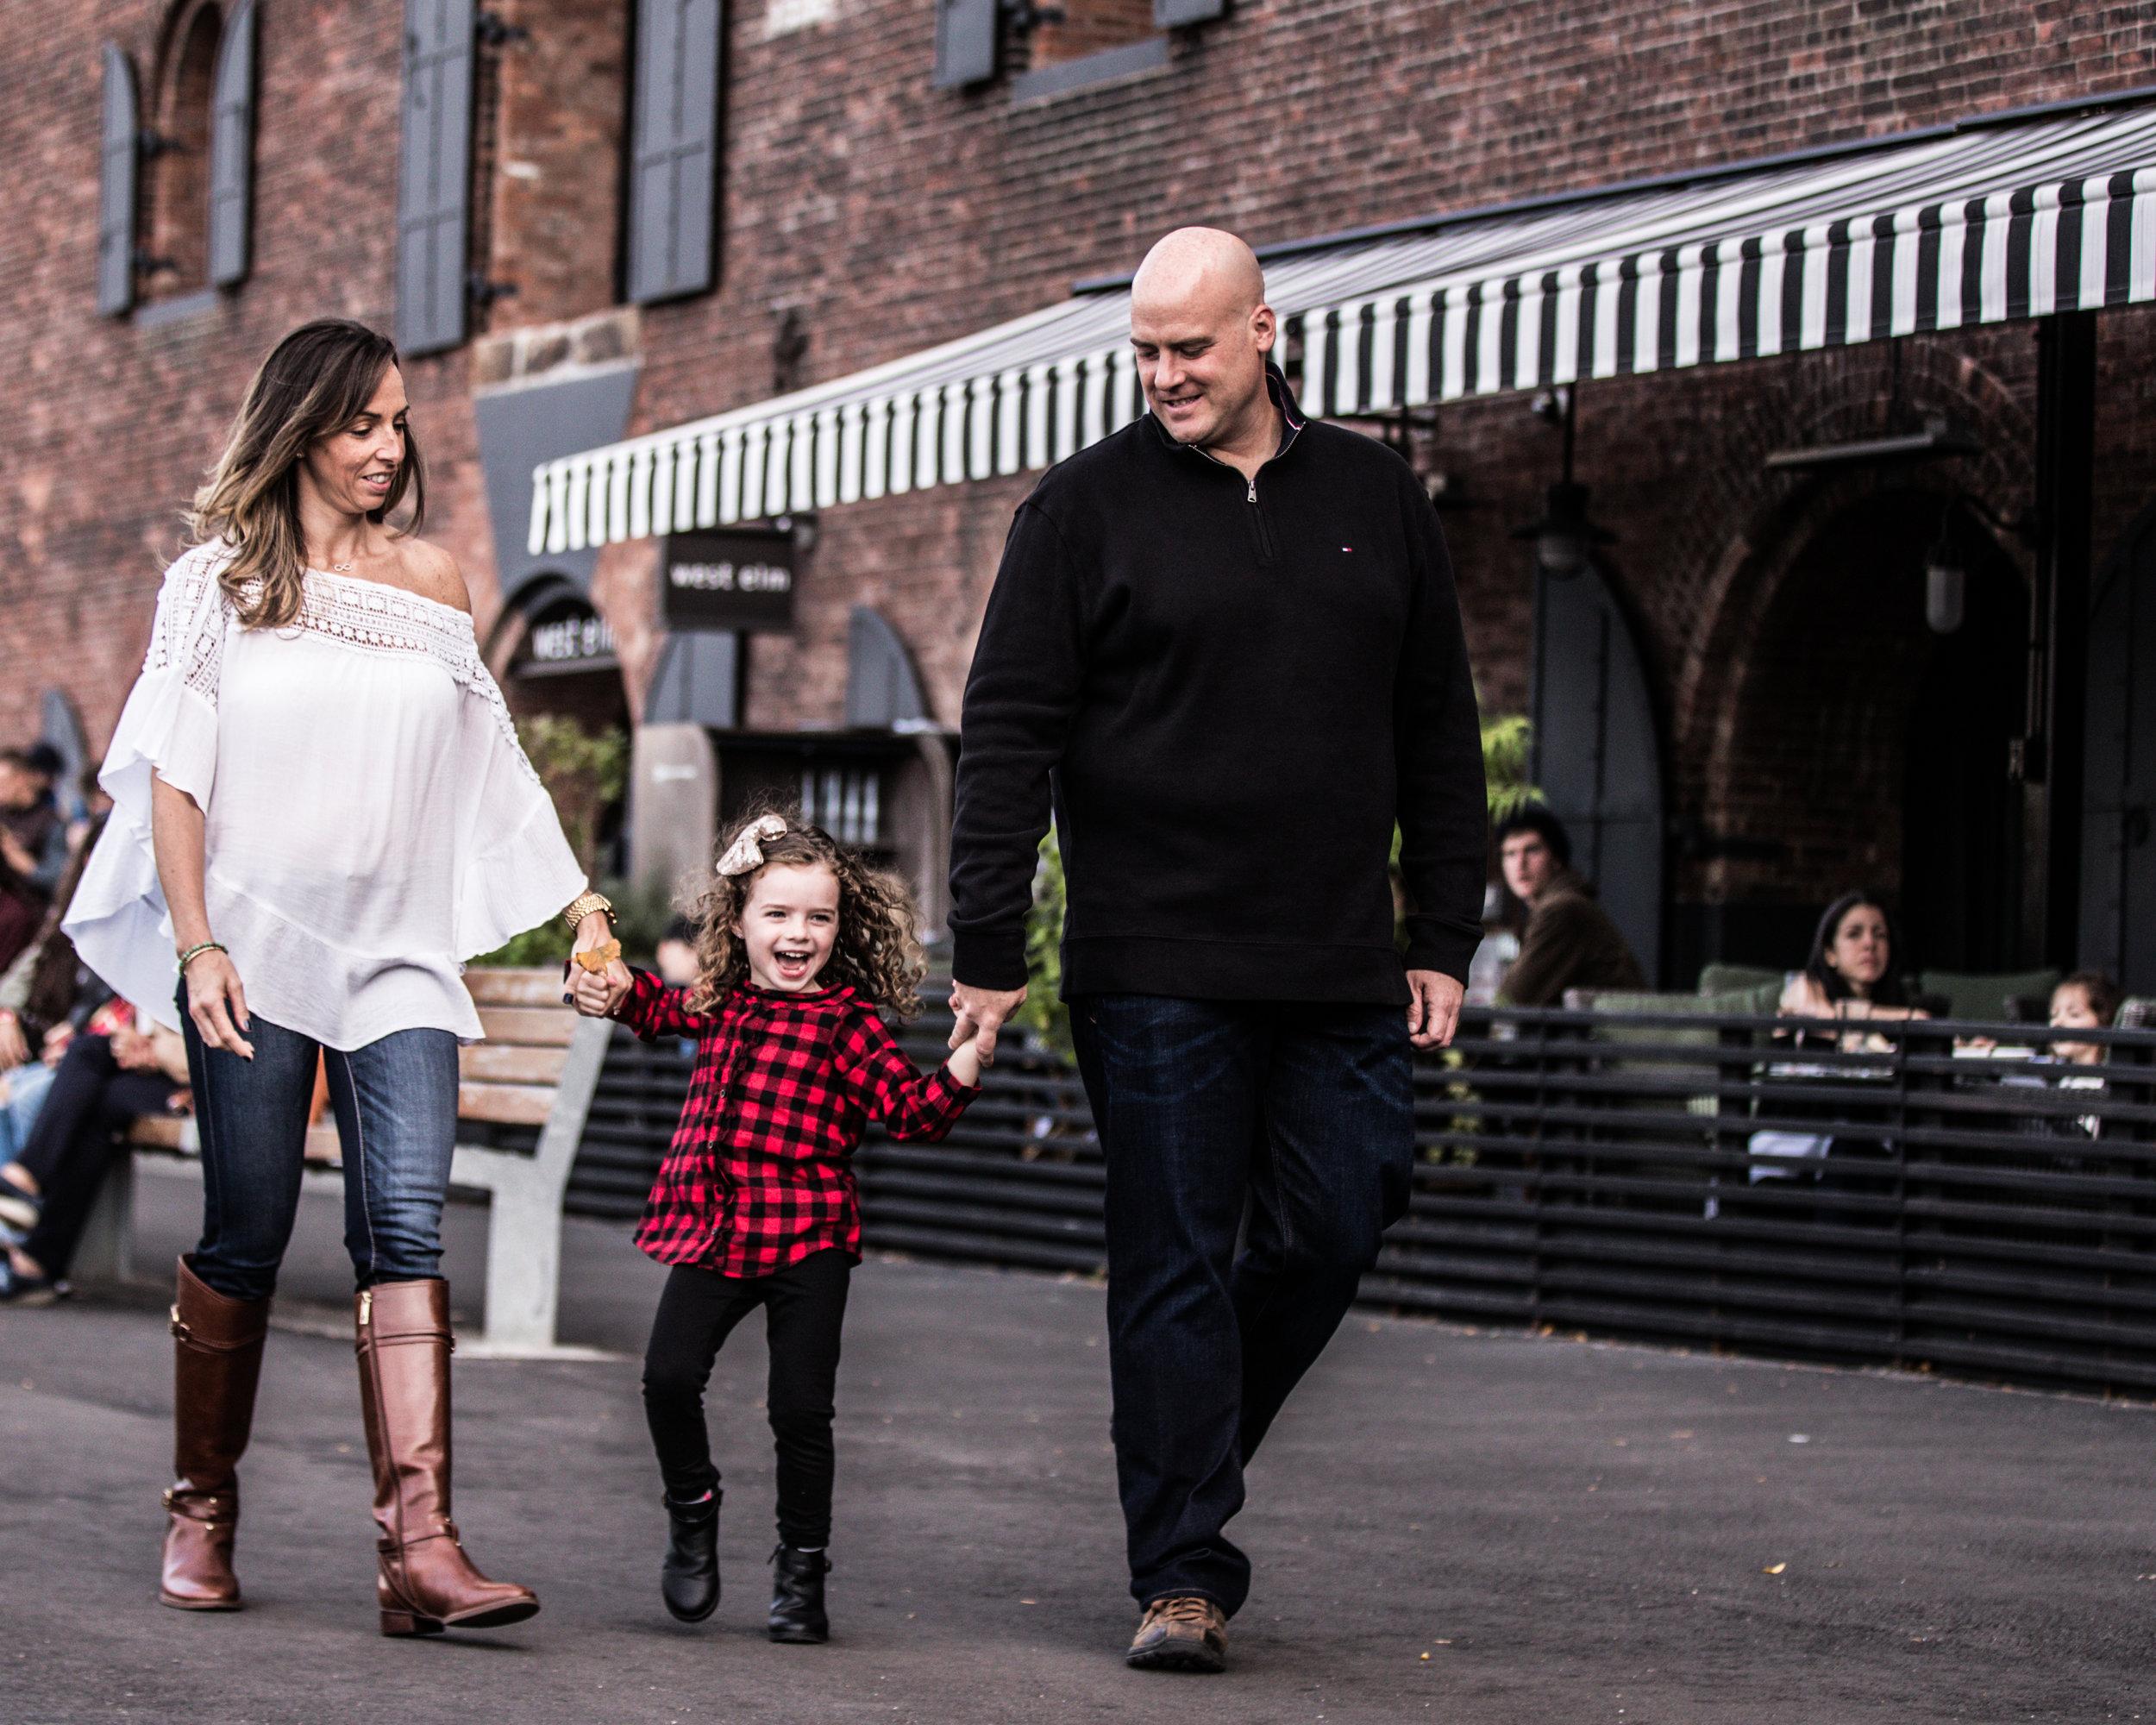 family-photo-shoot-brooklyn-new-york-fall-photos-13.jpg